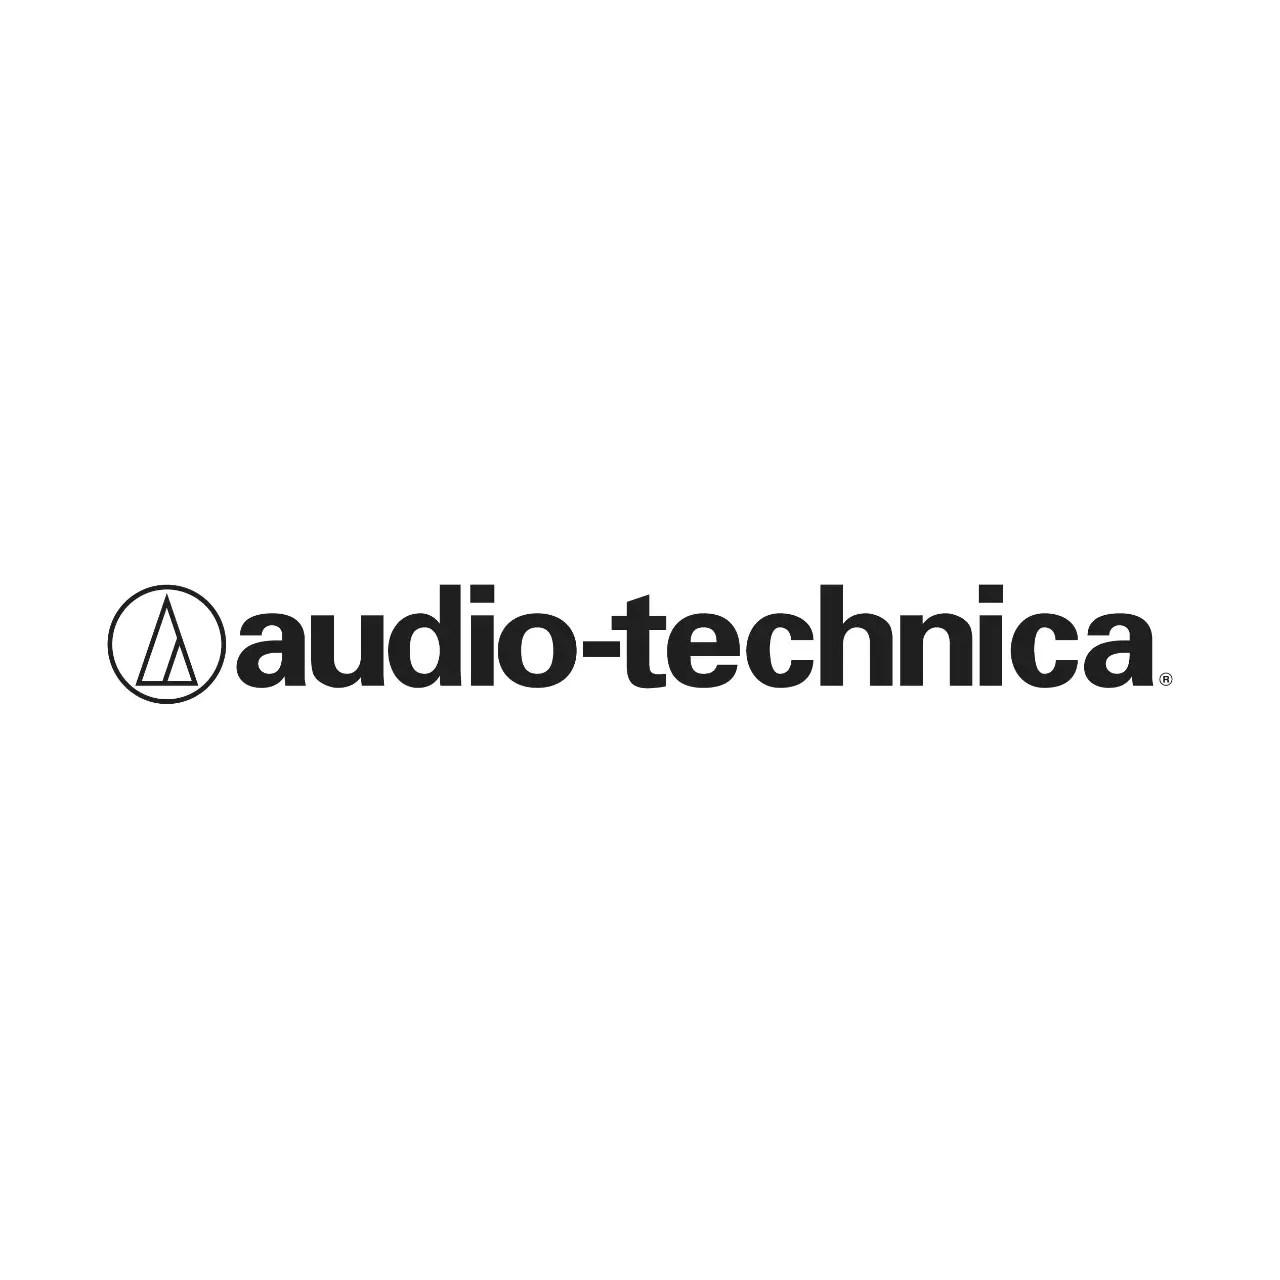 Audio Technica Logo